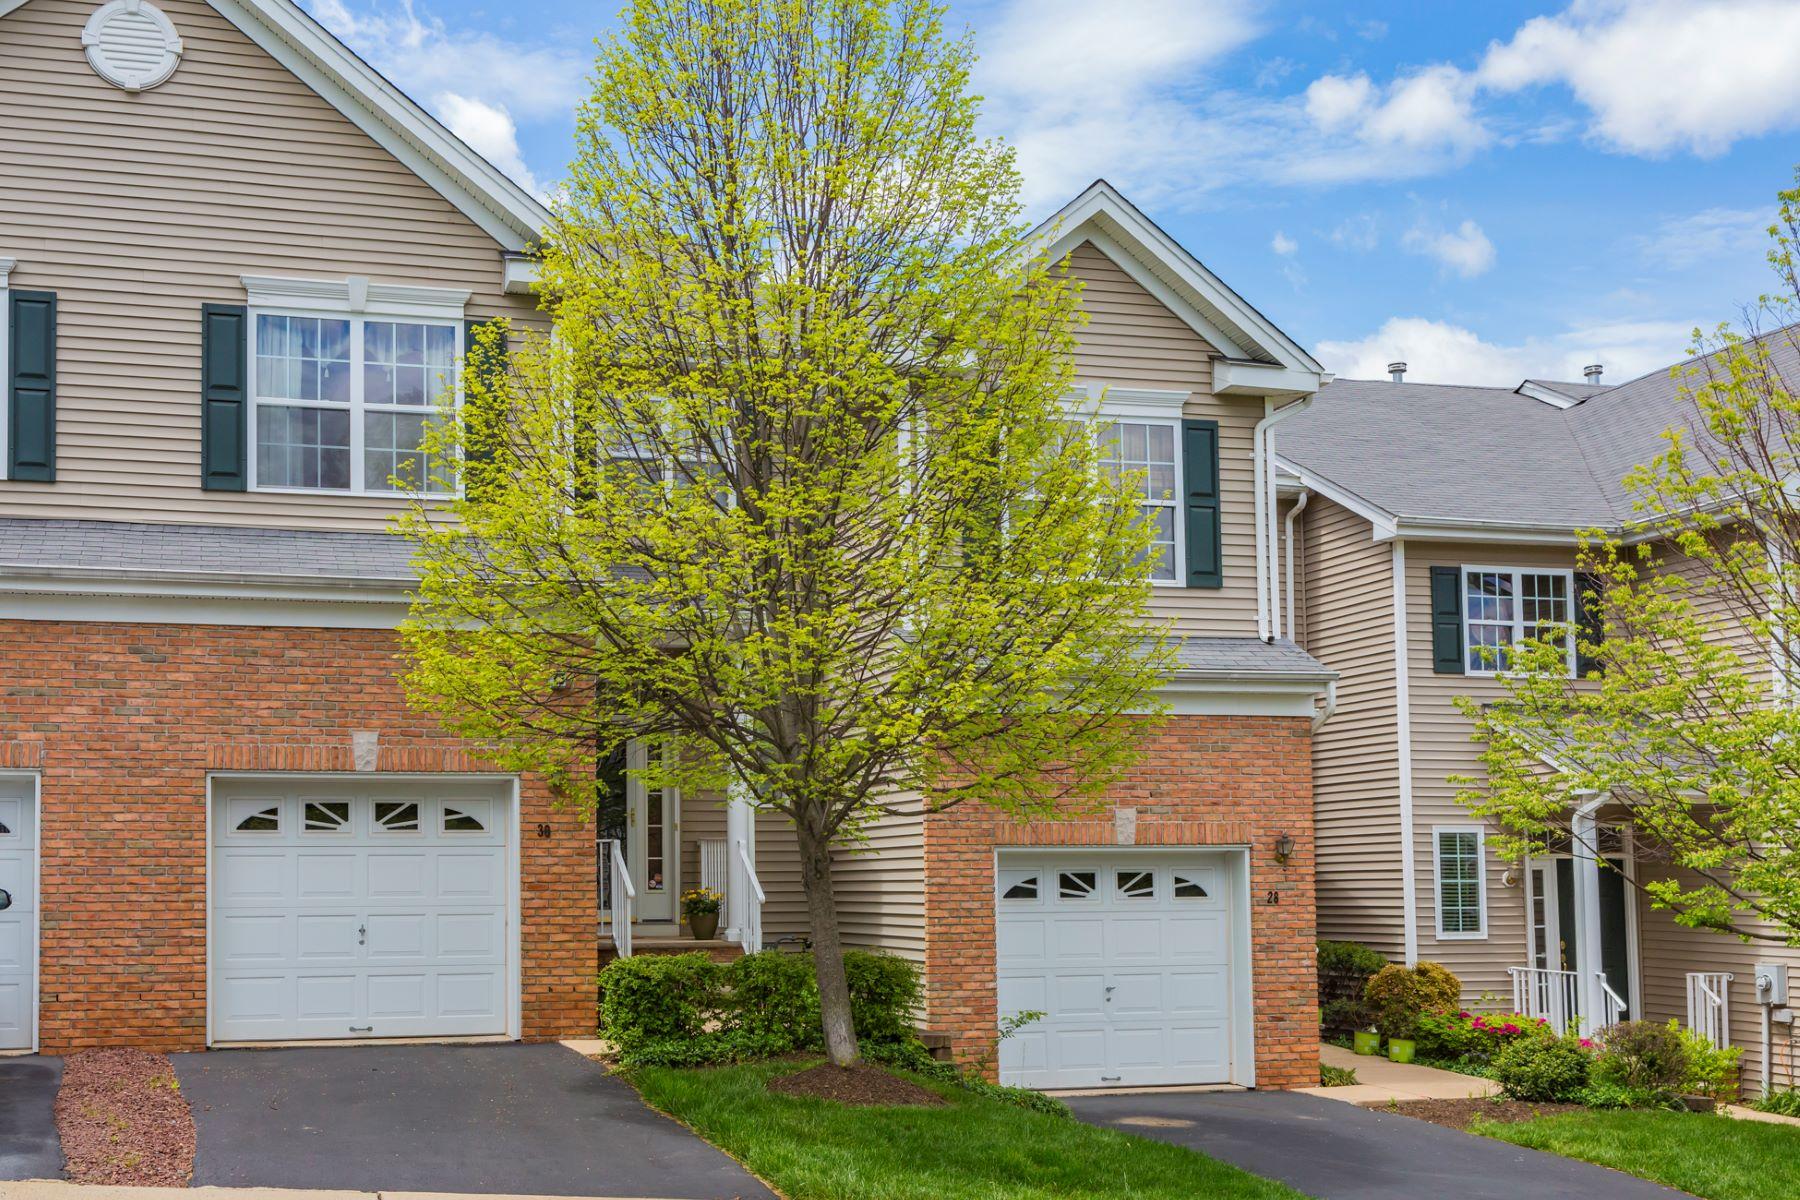 独户住宅 为 销售 在 Light, Bright, And Spacious - Montgomery Township 30 Hoover Avenue 普林斯顿, 新泽西州, 08540 美国